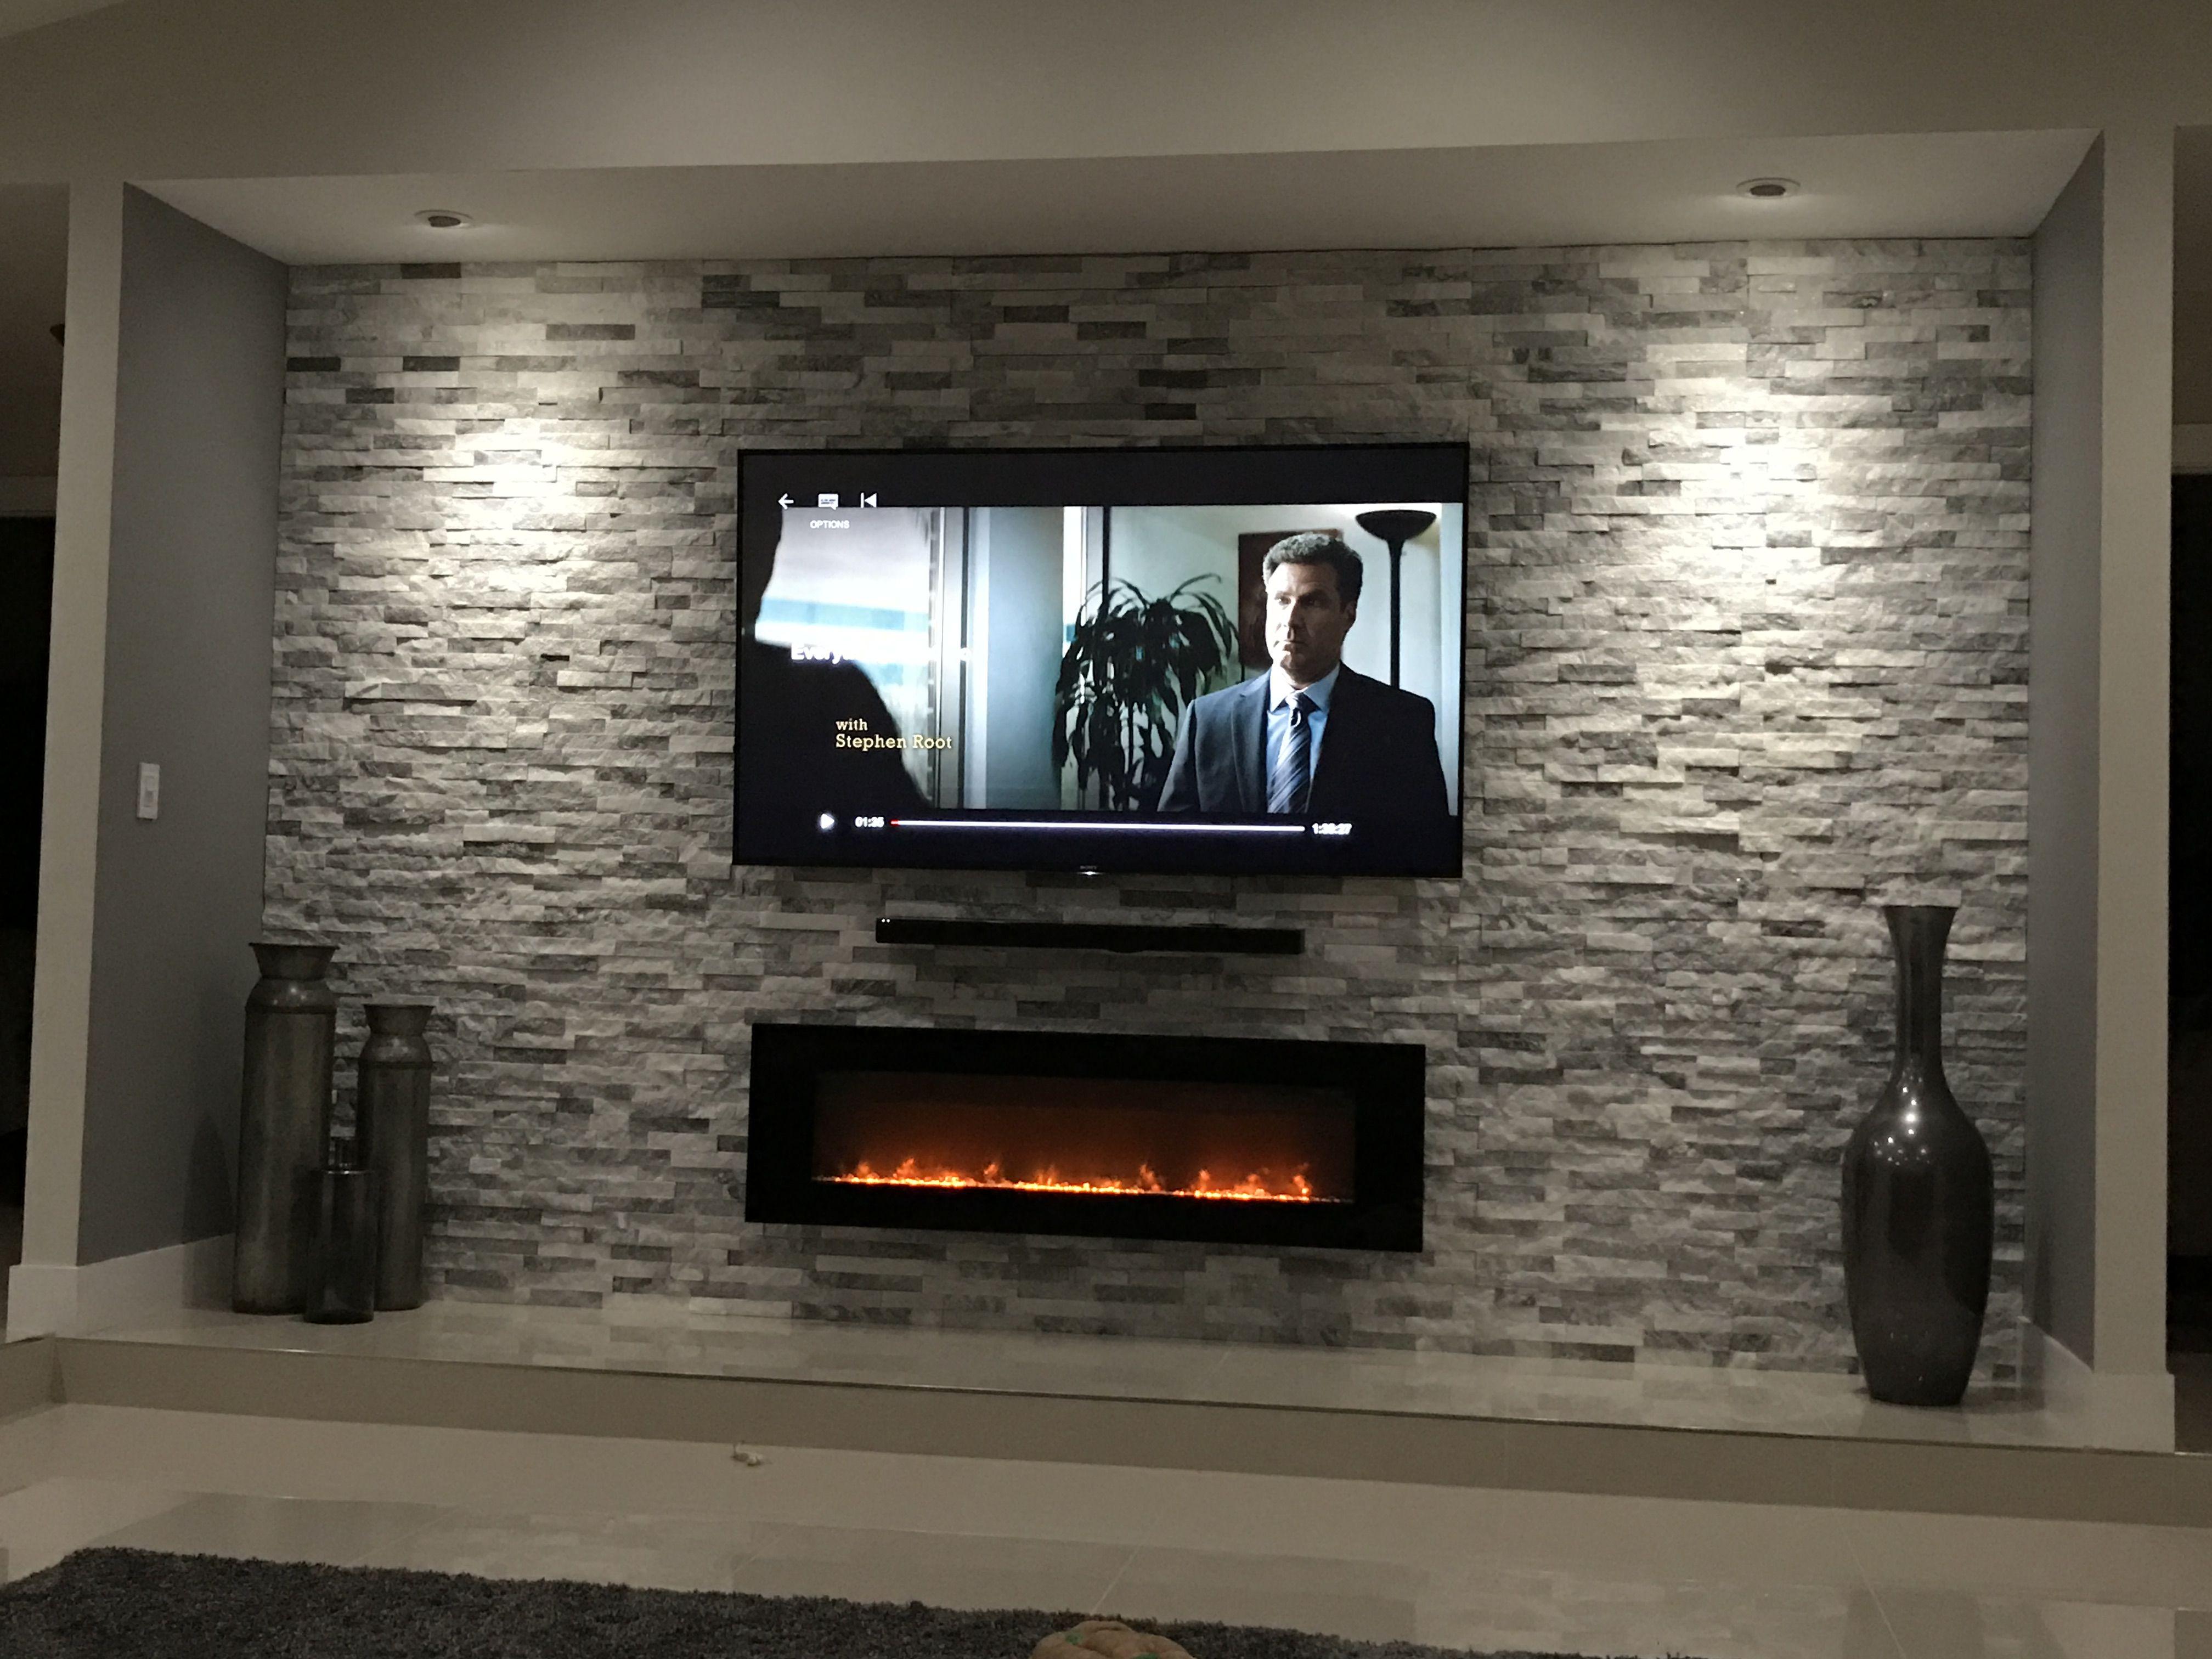 Pared Sala Arriba Living Room Tv Wall Fireplace Tv Wall Tv Wall Design #tv #settings #in #living #room